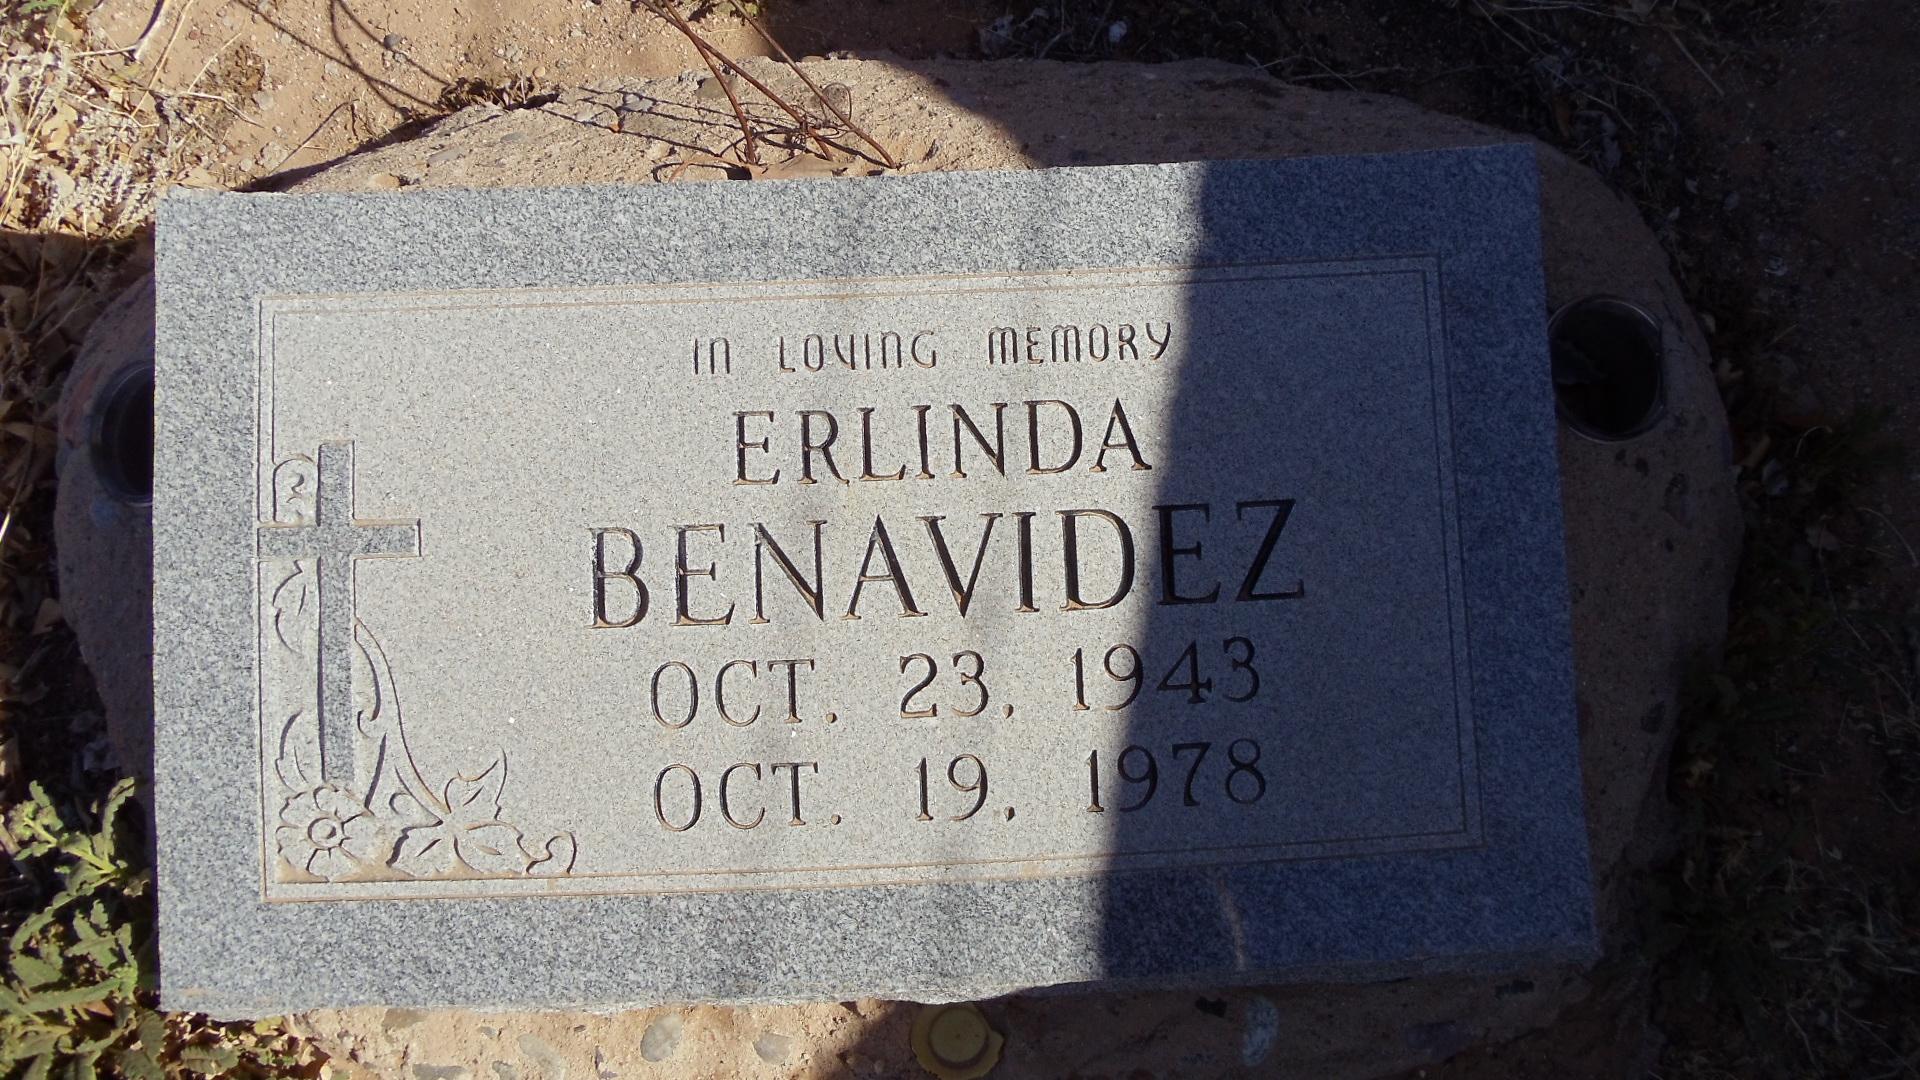 Erlinda Benavidez